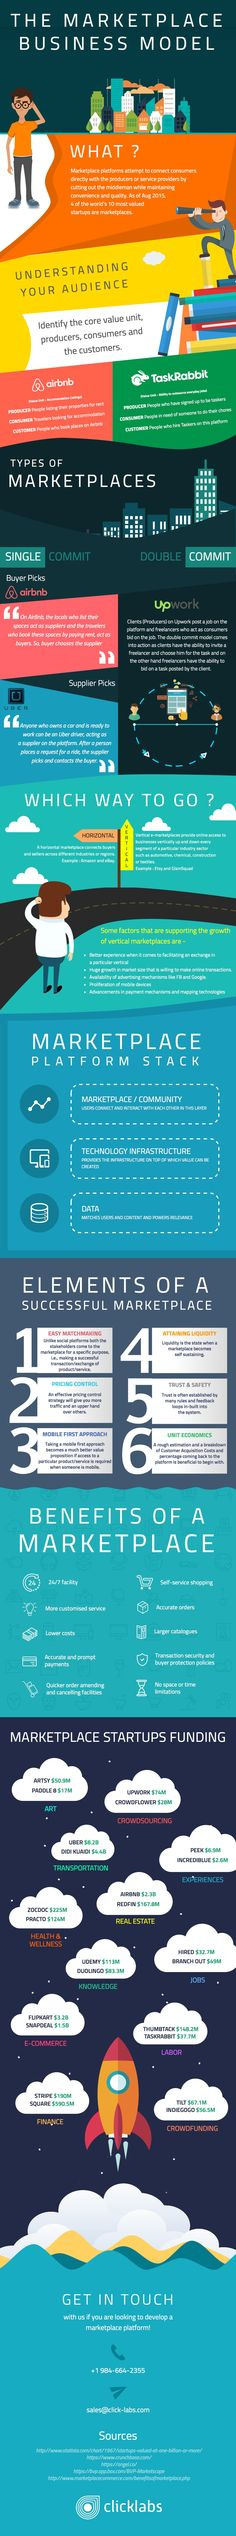 Understanding the marketplace business model